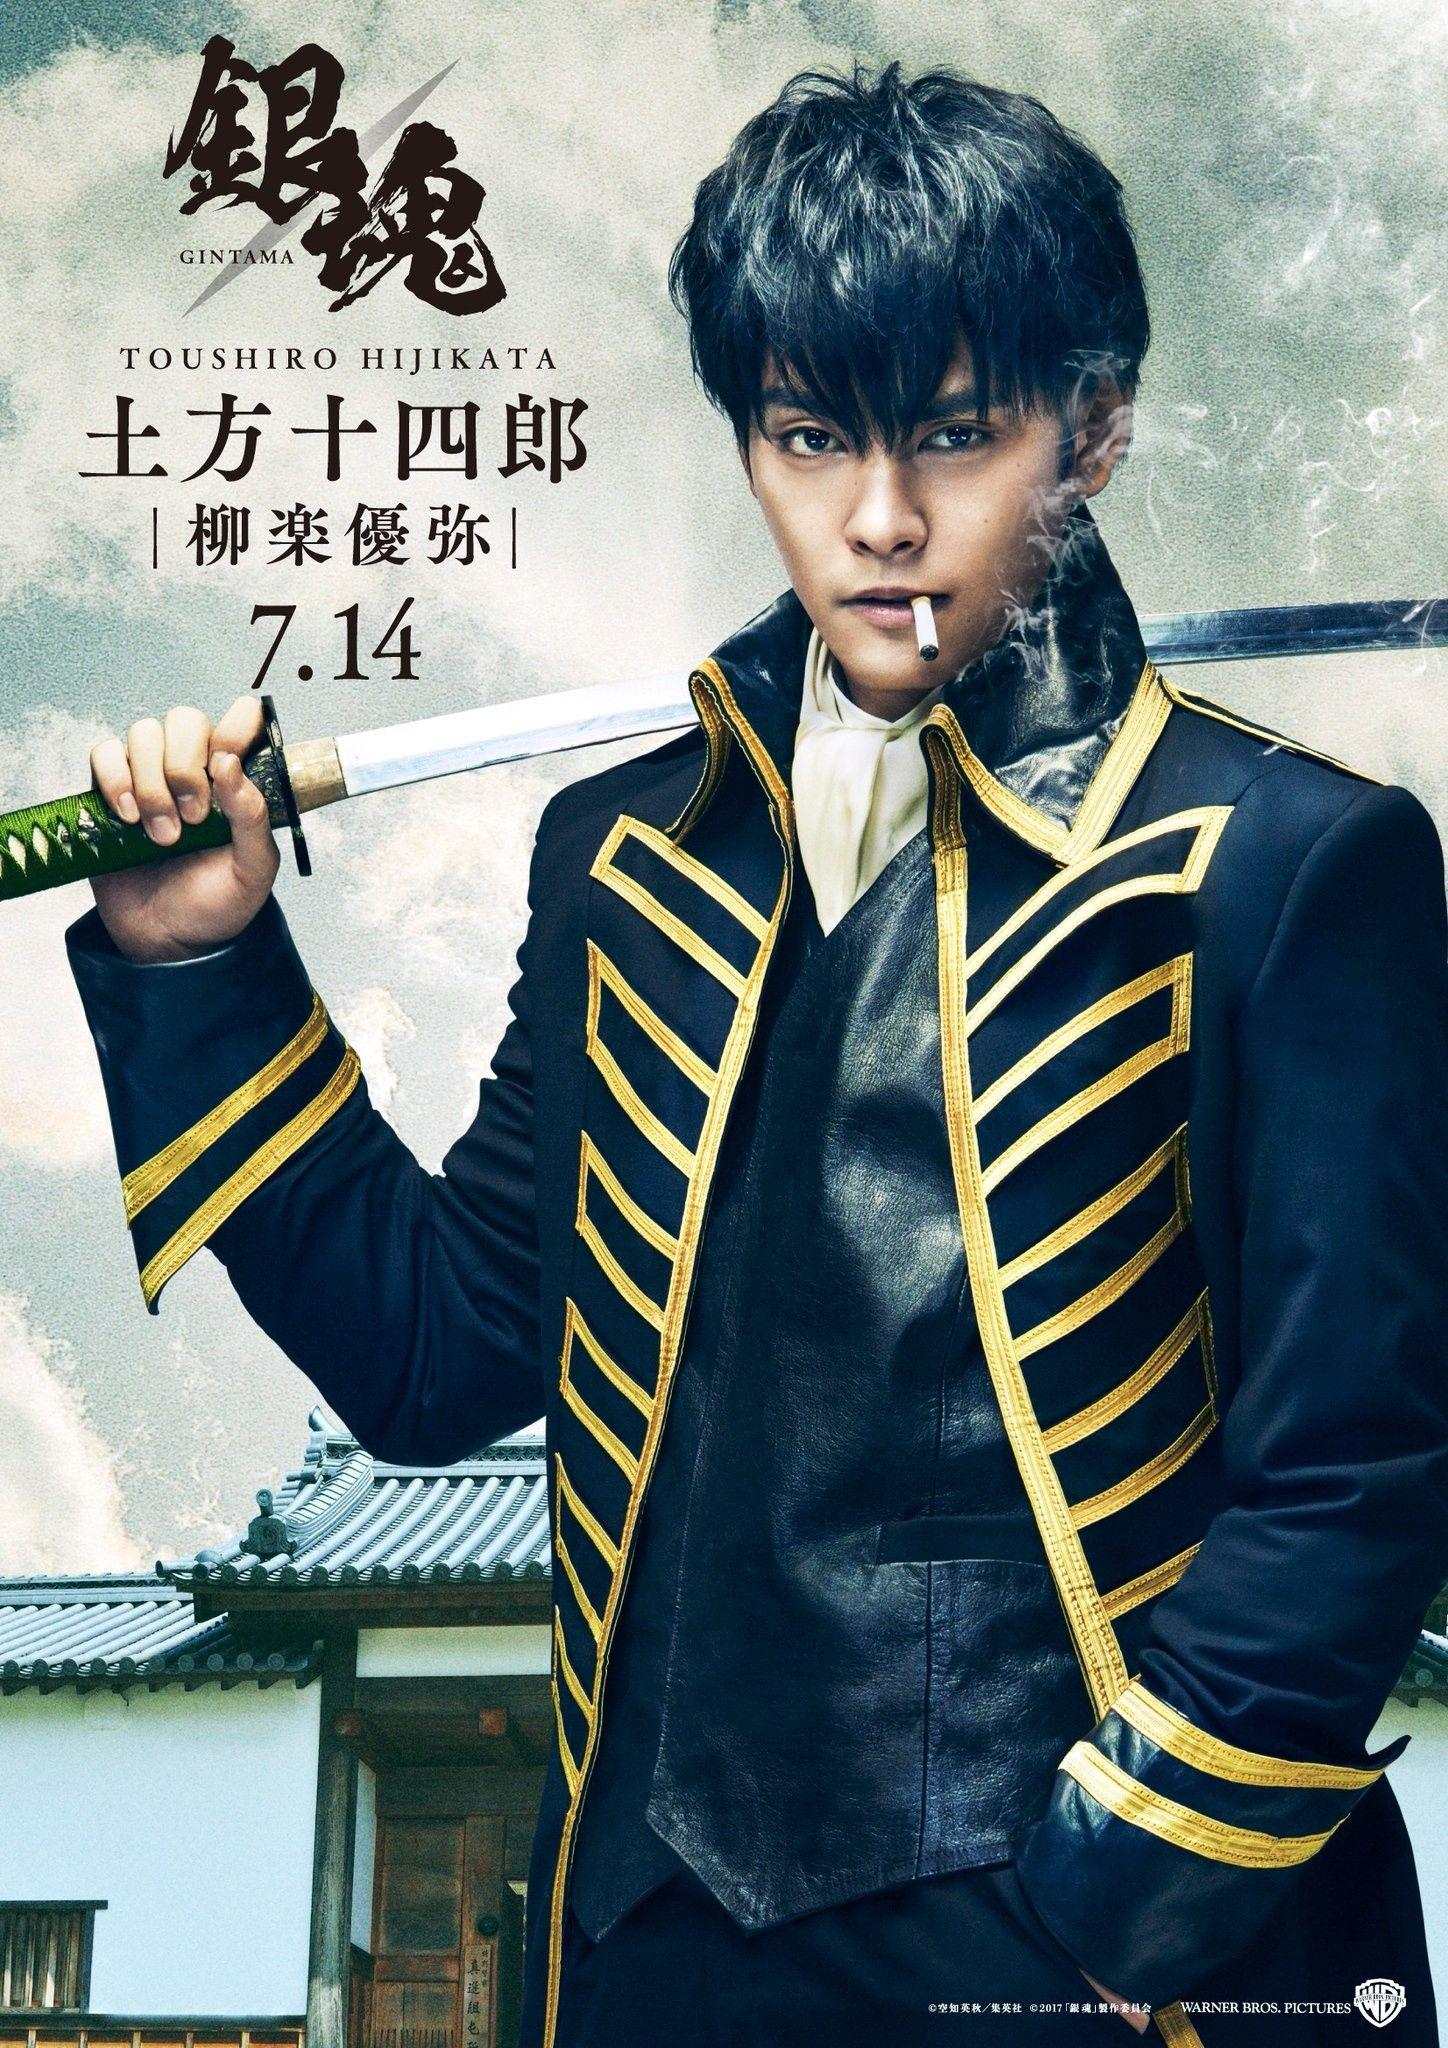 Gintama LiveAction Movie Releases Shinsengumi Visuals!